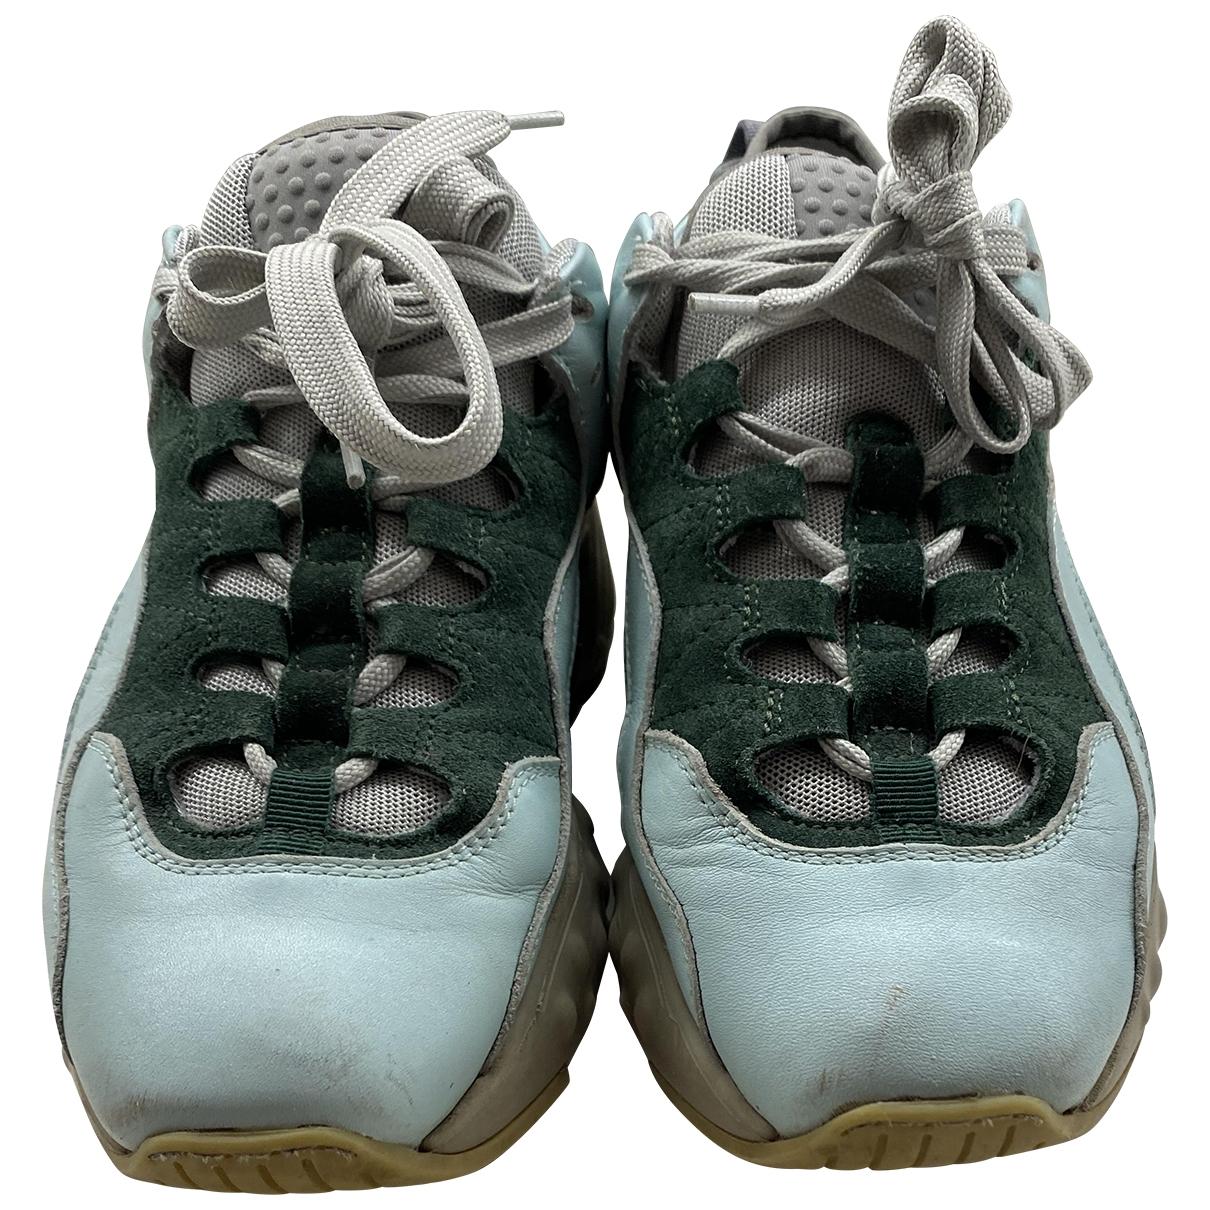 Acne Studios Manhattan Sneakers in  Gruen Leder